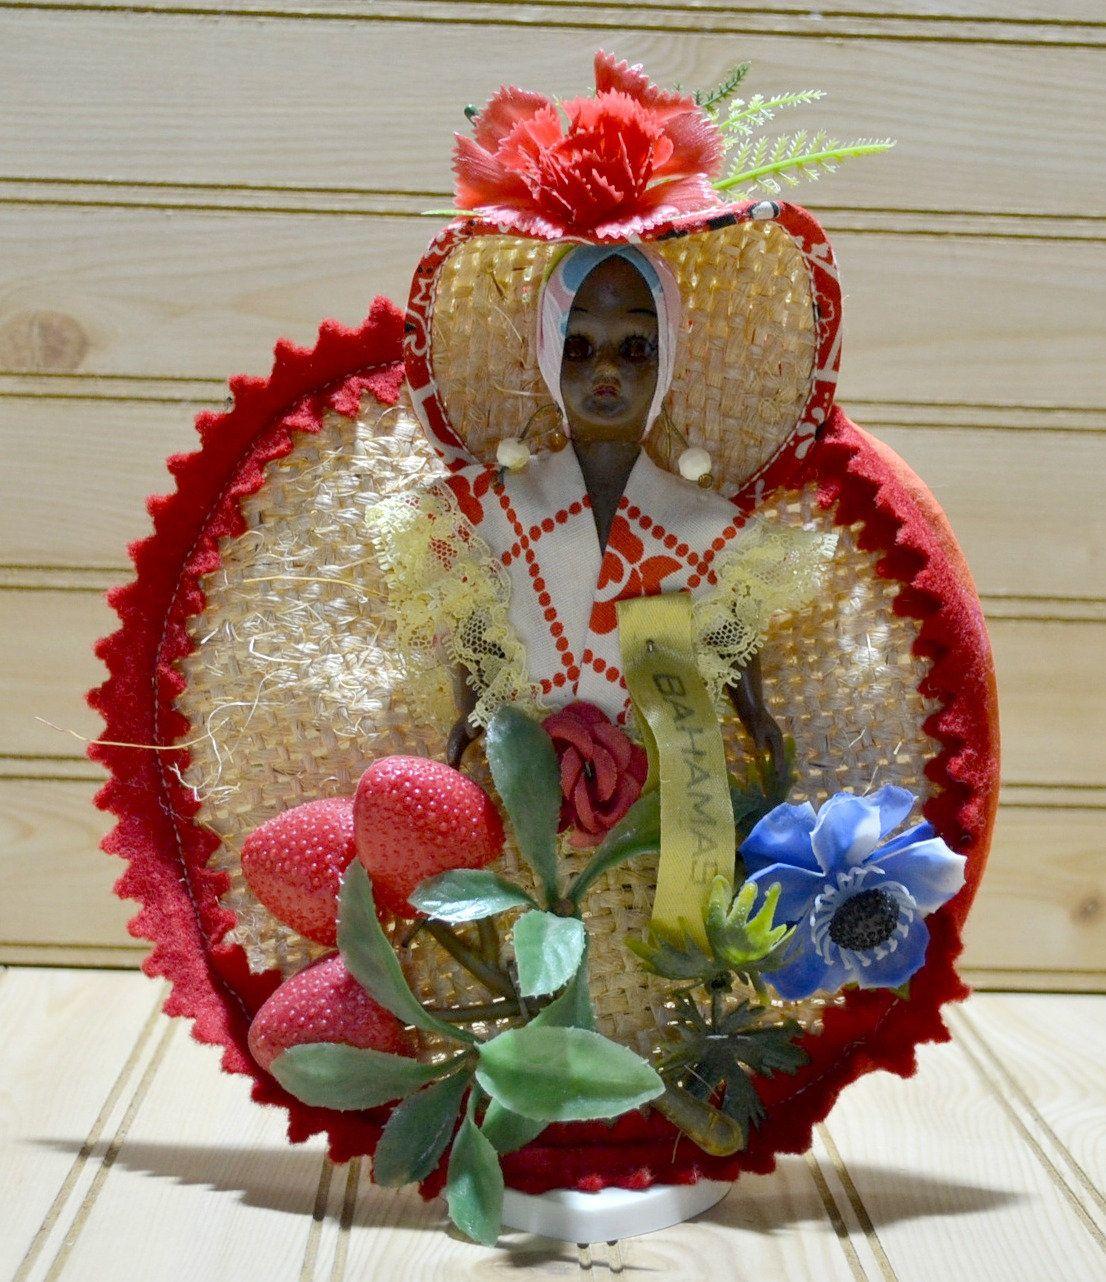 Vintage Bahamas Souvenir Doll Island Girl 1970s Collectible Memorabilia Knick Knack Sleepy Eyes Plastic Fruit #knickknack